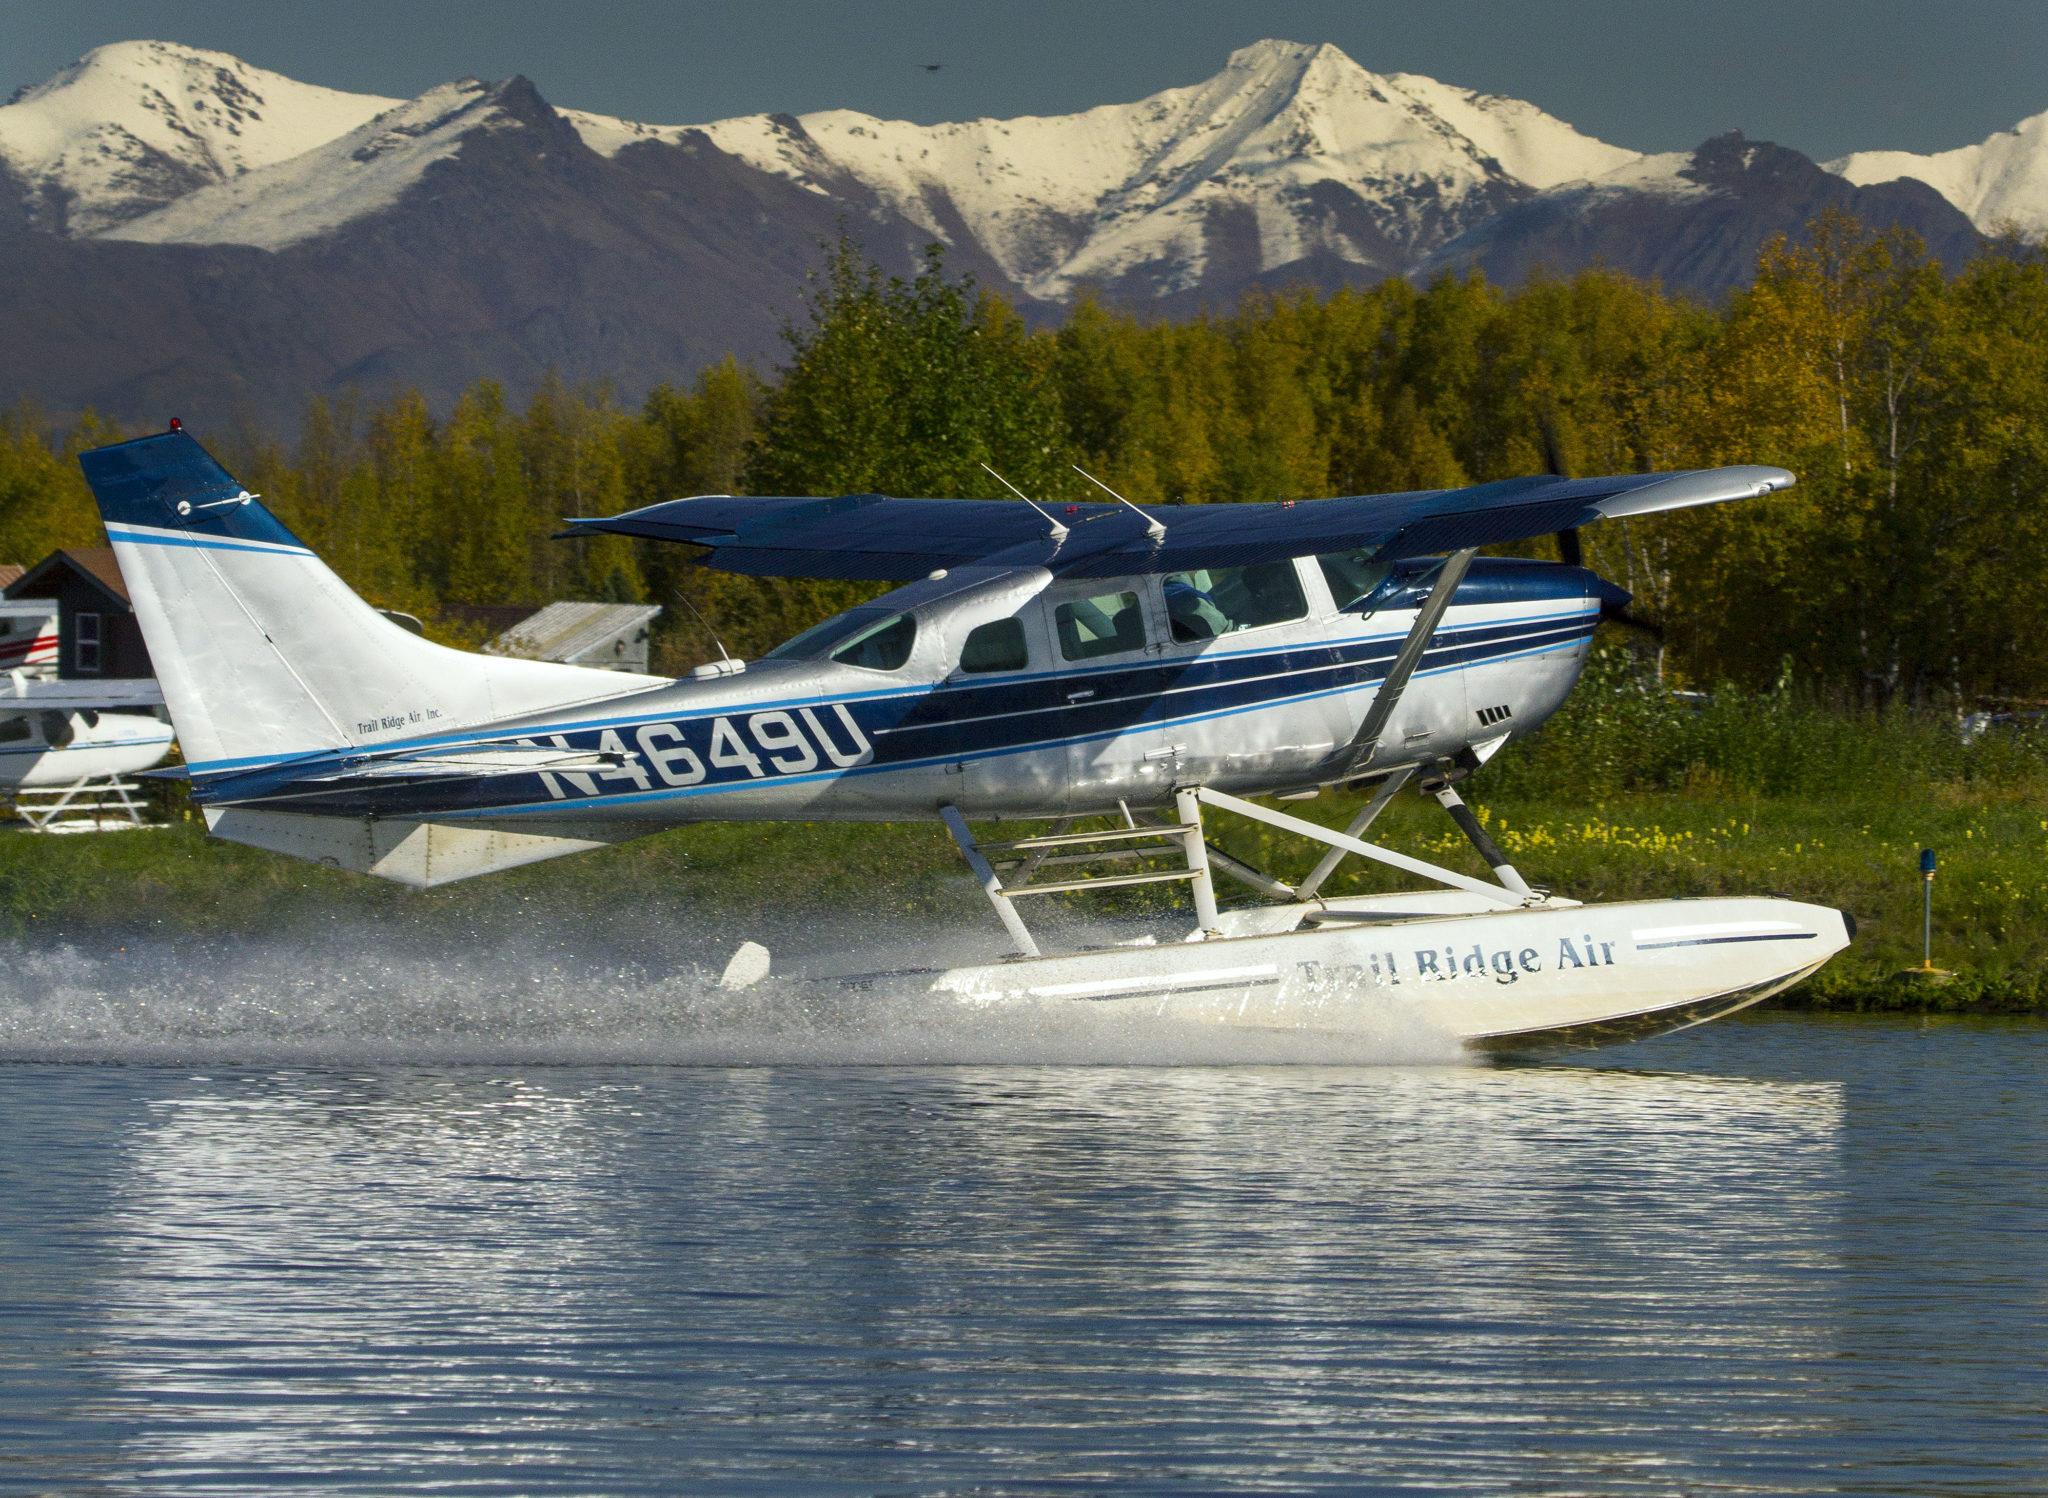 Best Aircraft Photography Alaska | Alaskafoto - Aircraft Portraits & Environmental Portraits